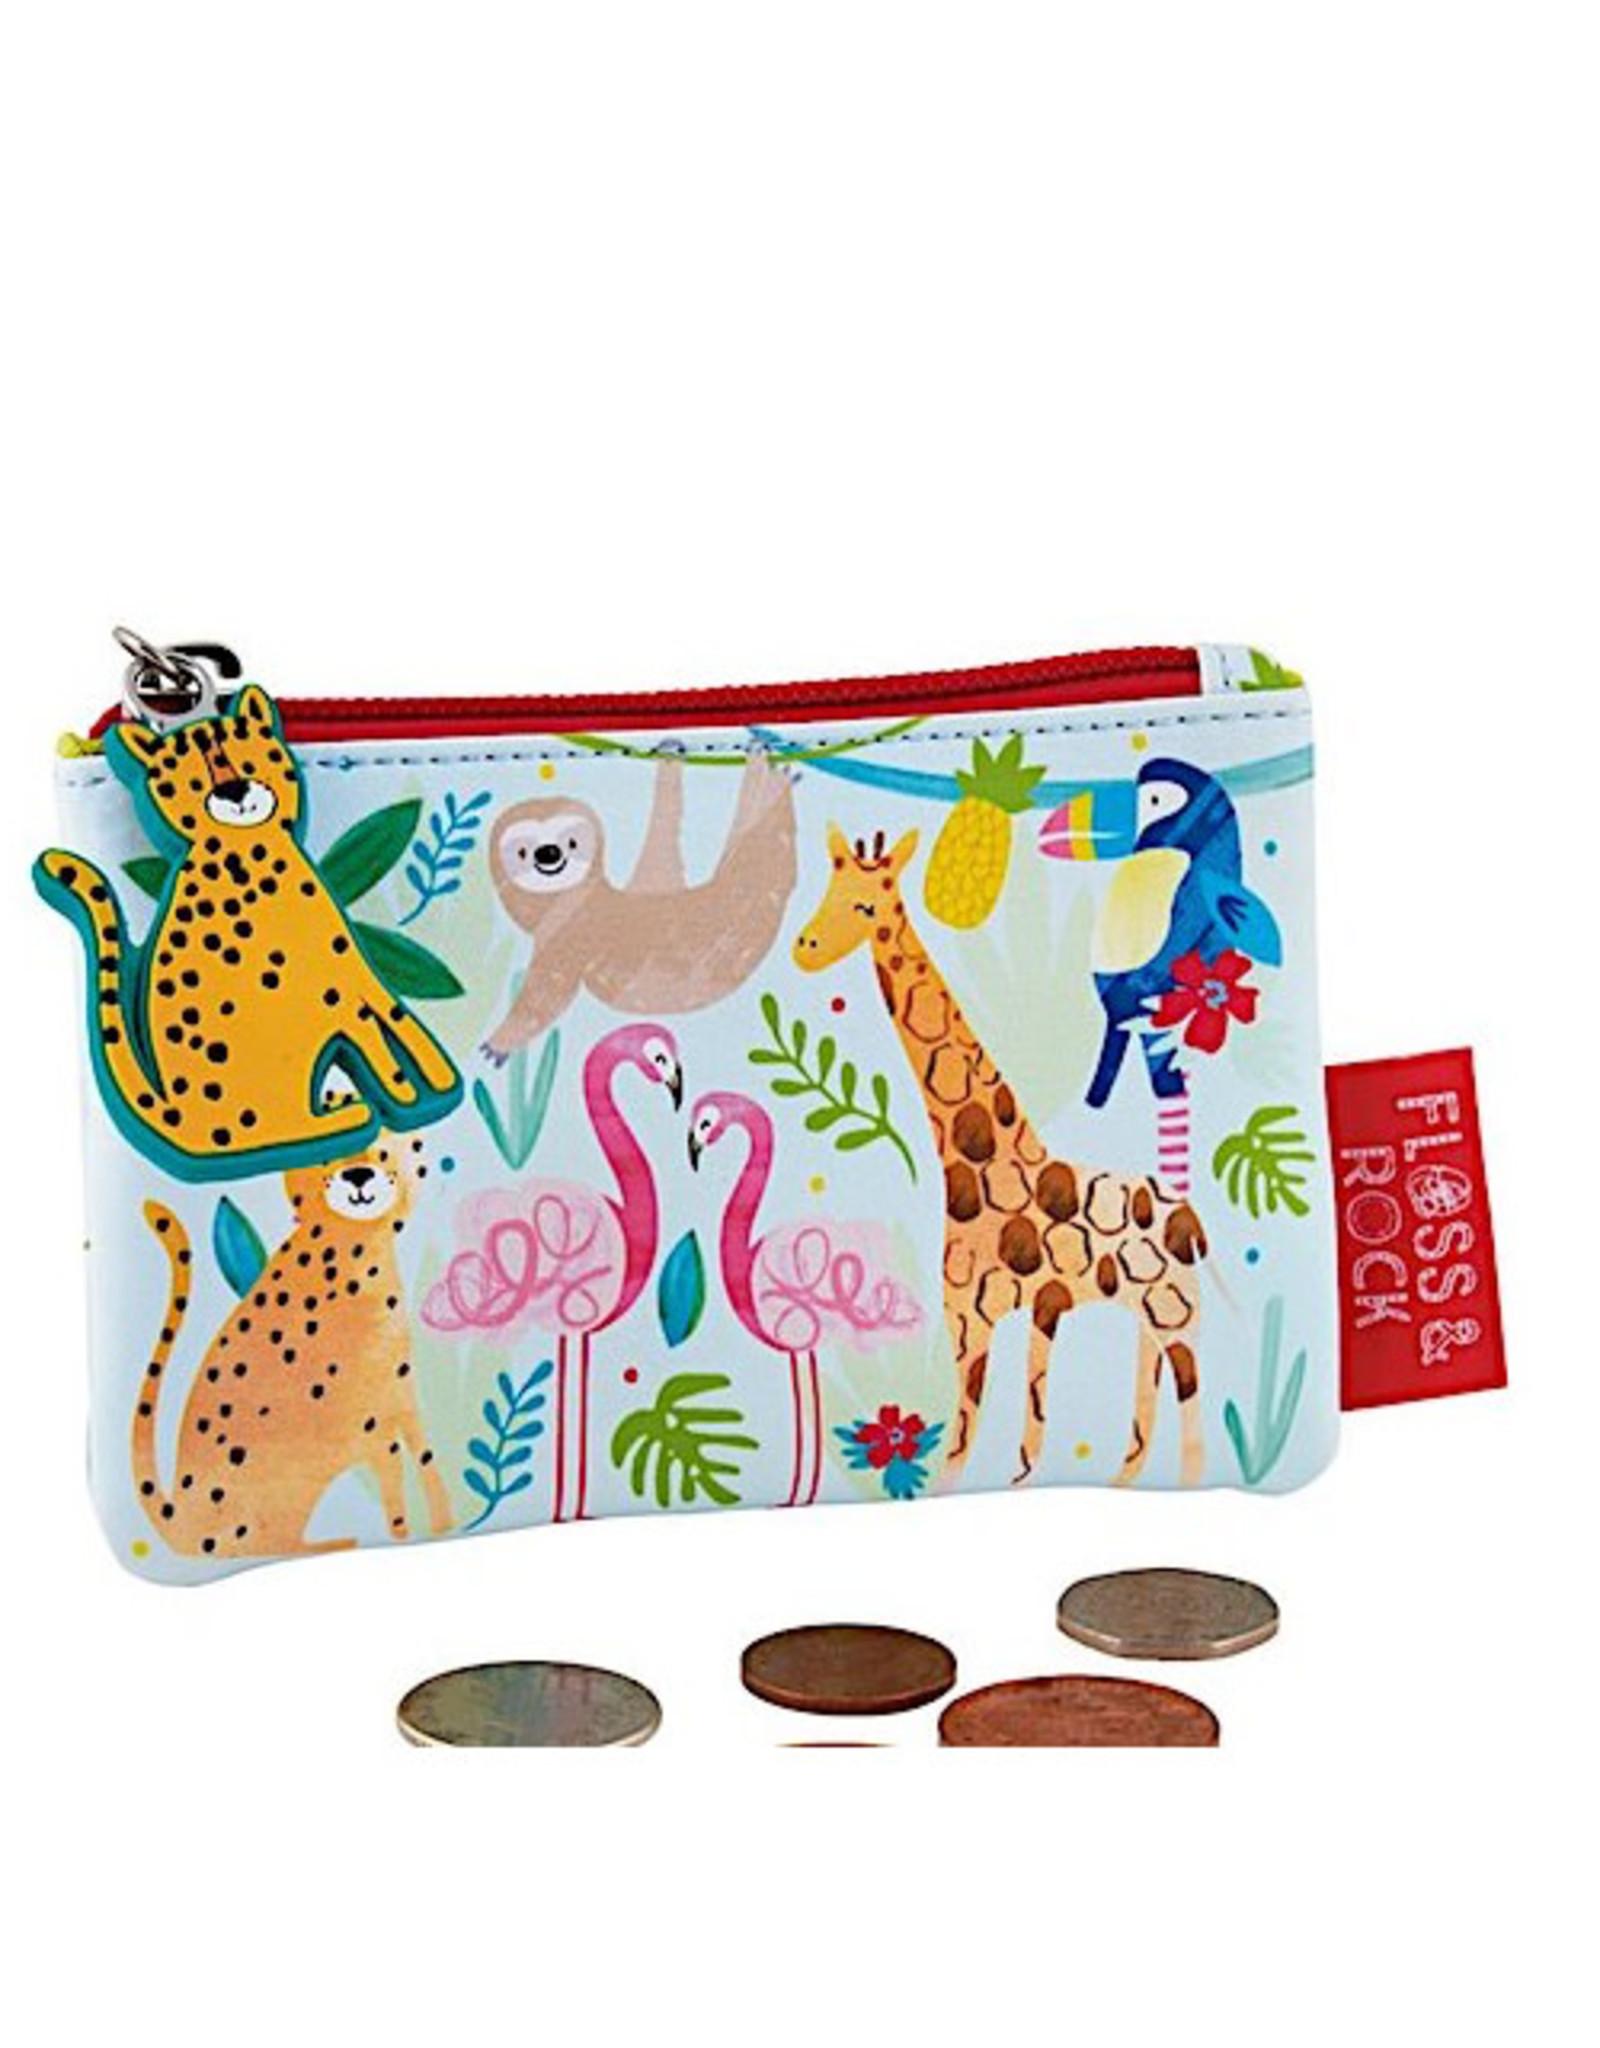 Floss & Rock Purse Wallet